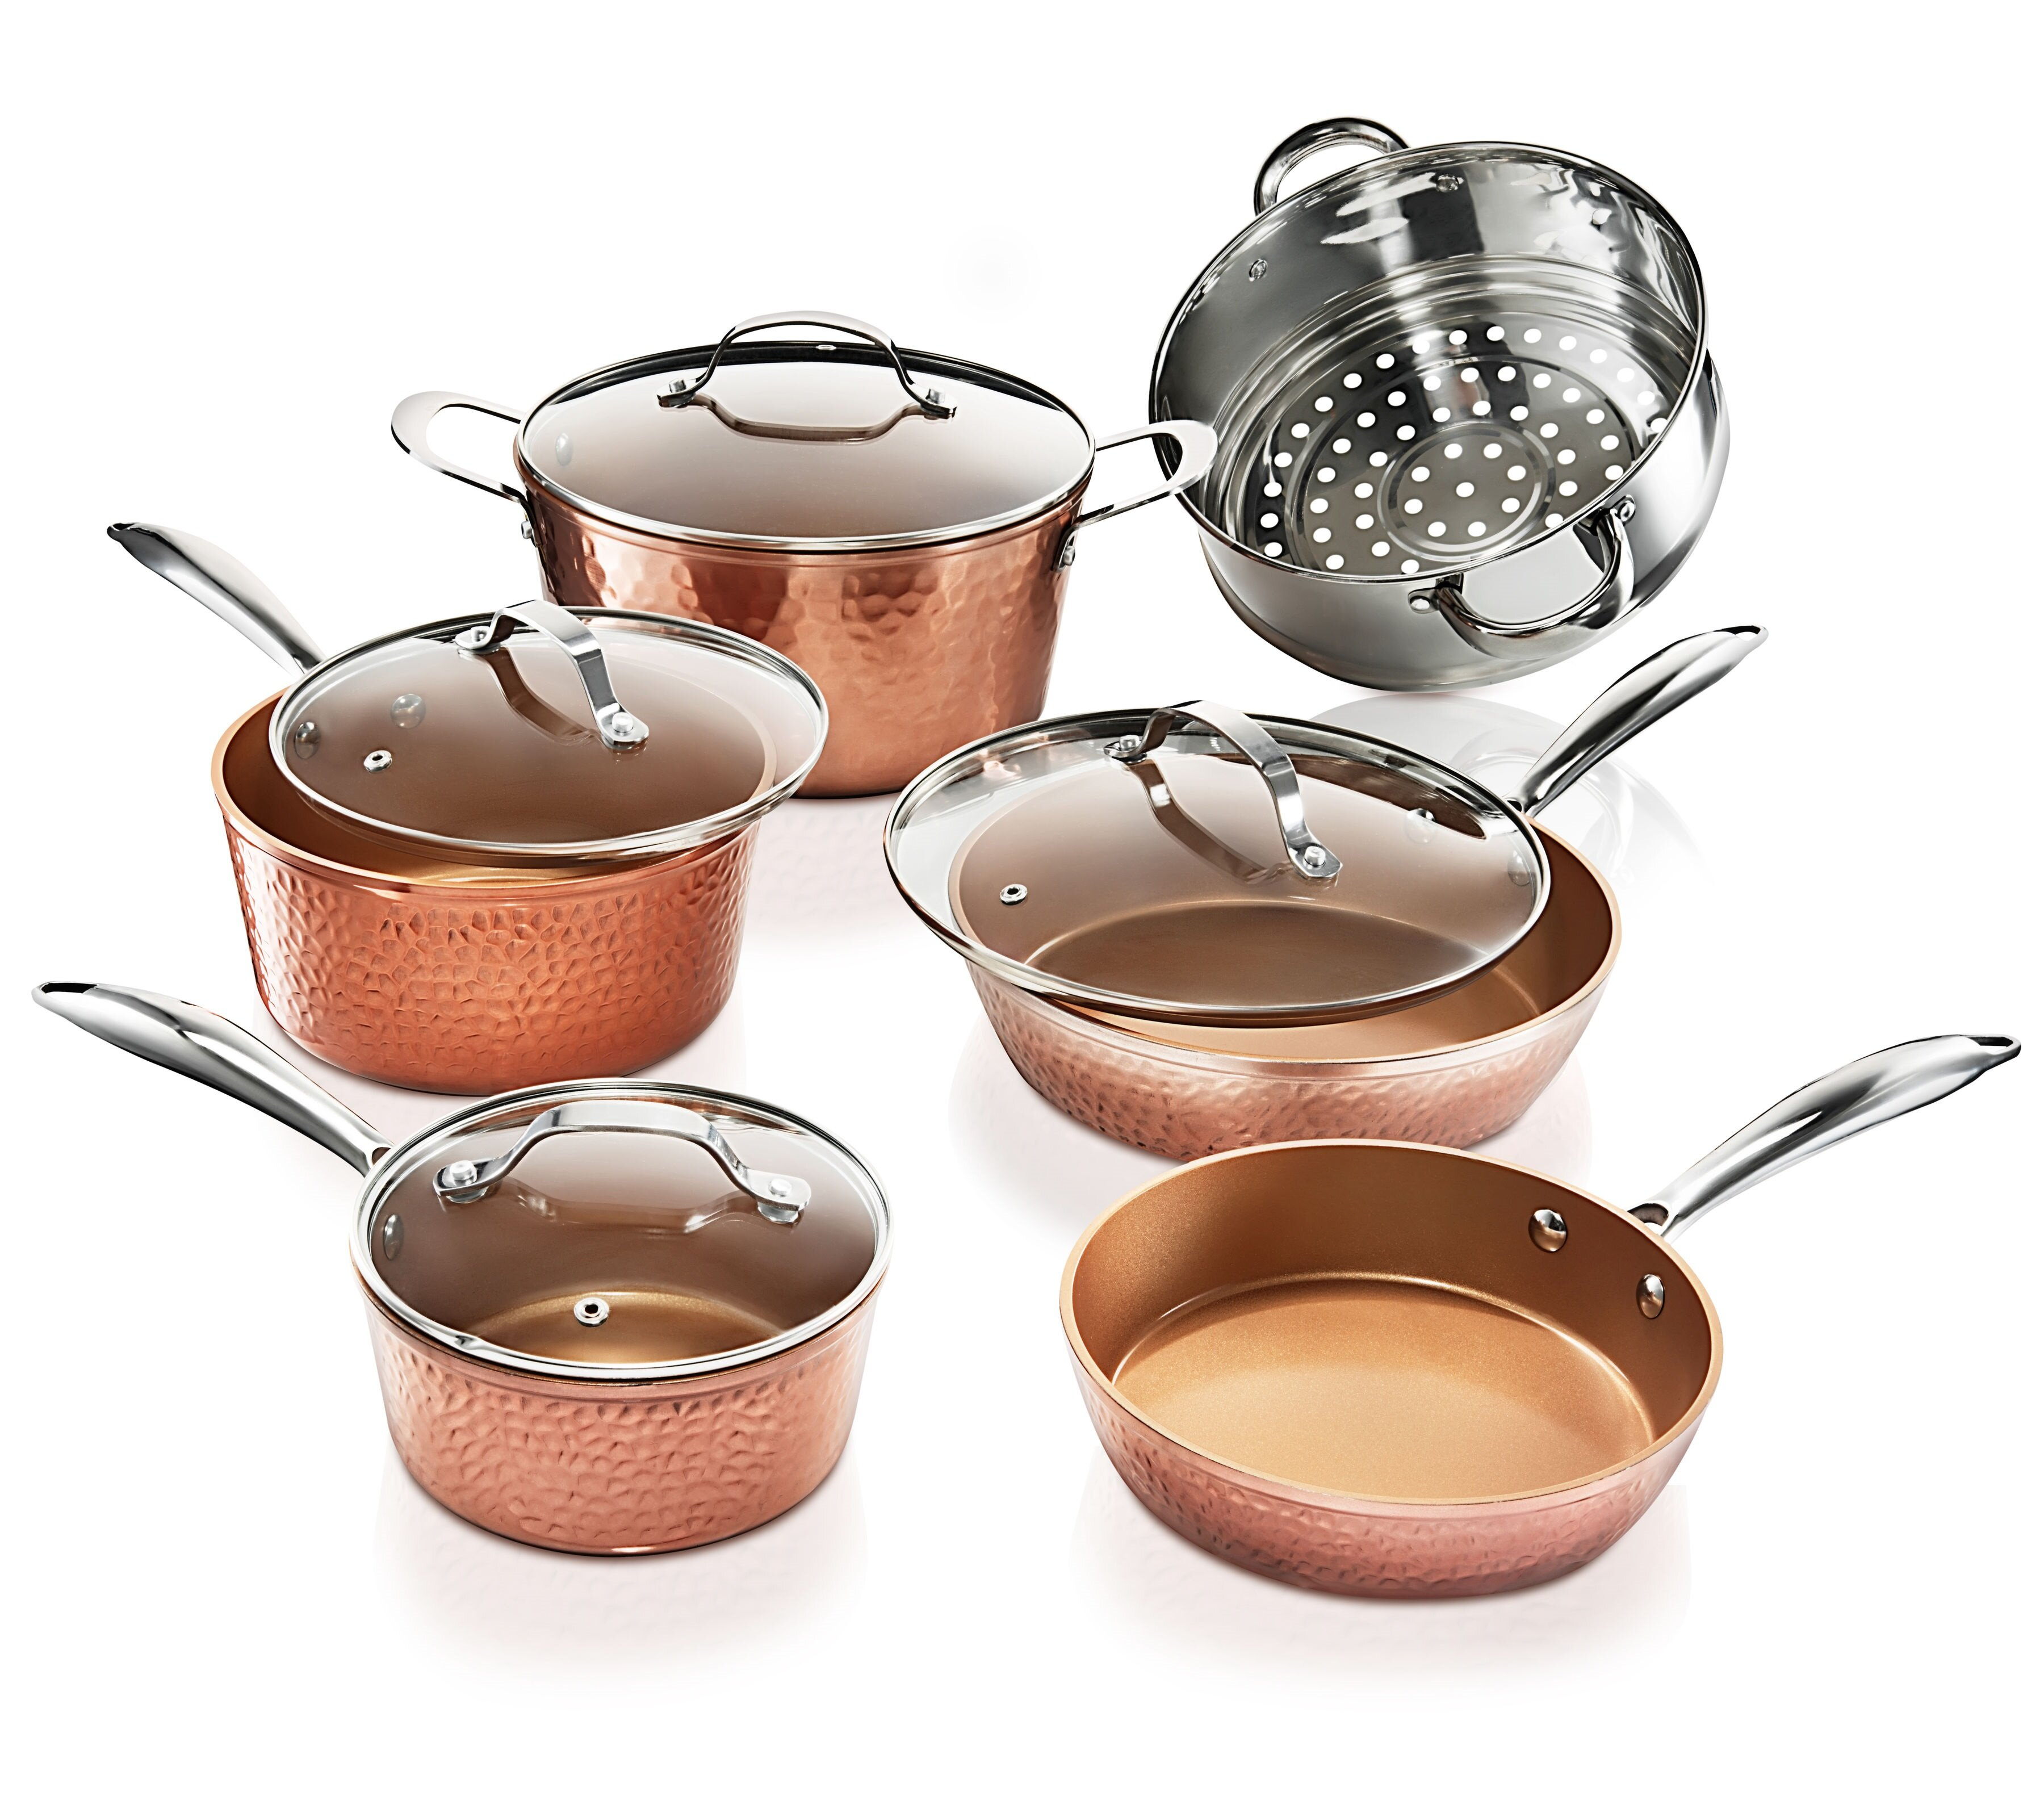 Gotham Steel Hammered Copper 4 Piece Stainless Steel Non Stick Cookware Set